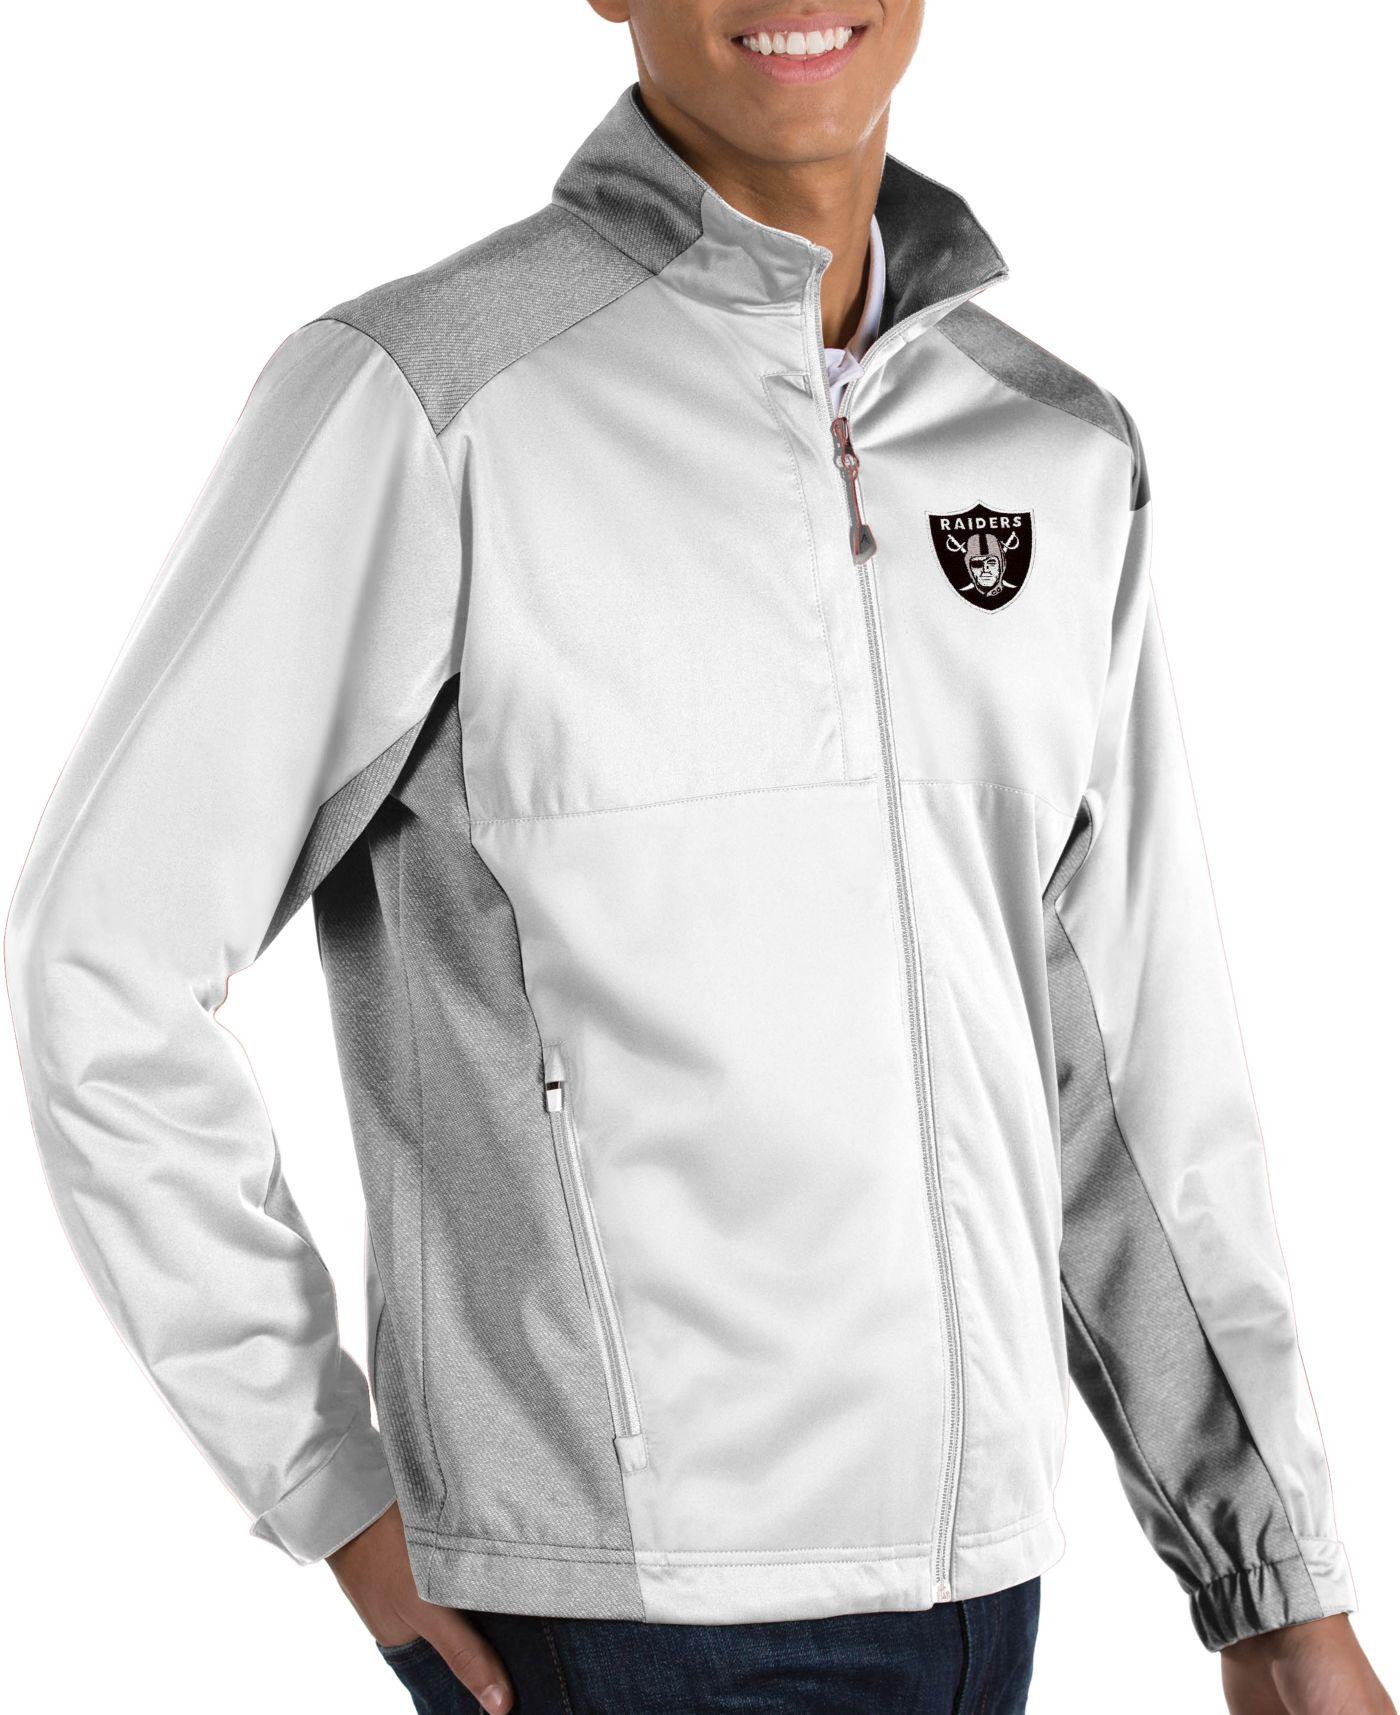 Antigua Men's Oakland Raiders Revolve White Full-Zip Jacket